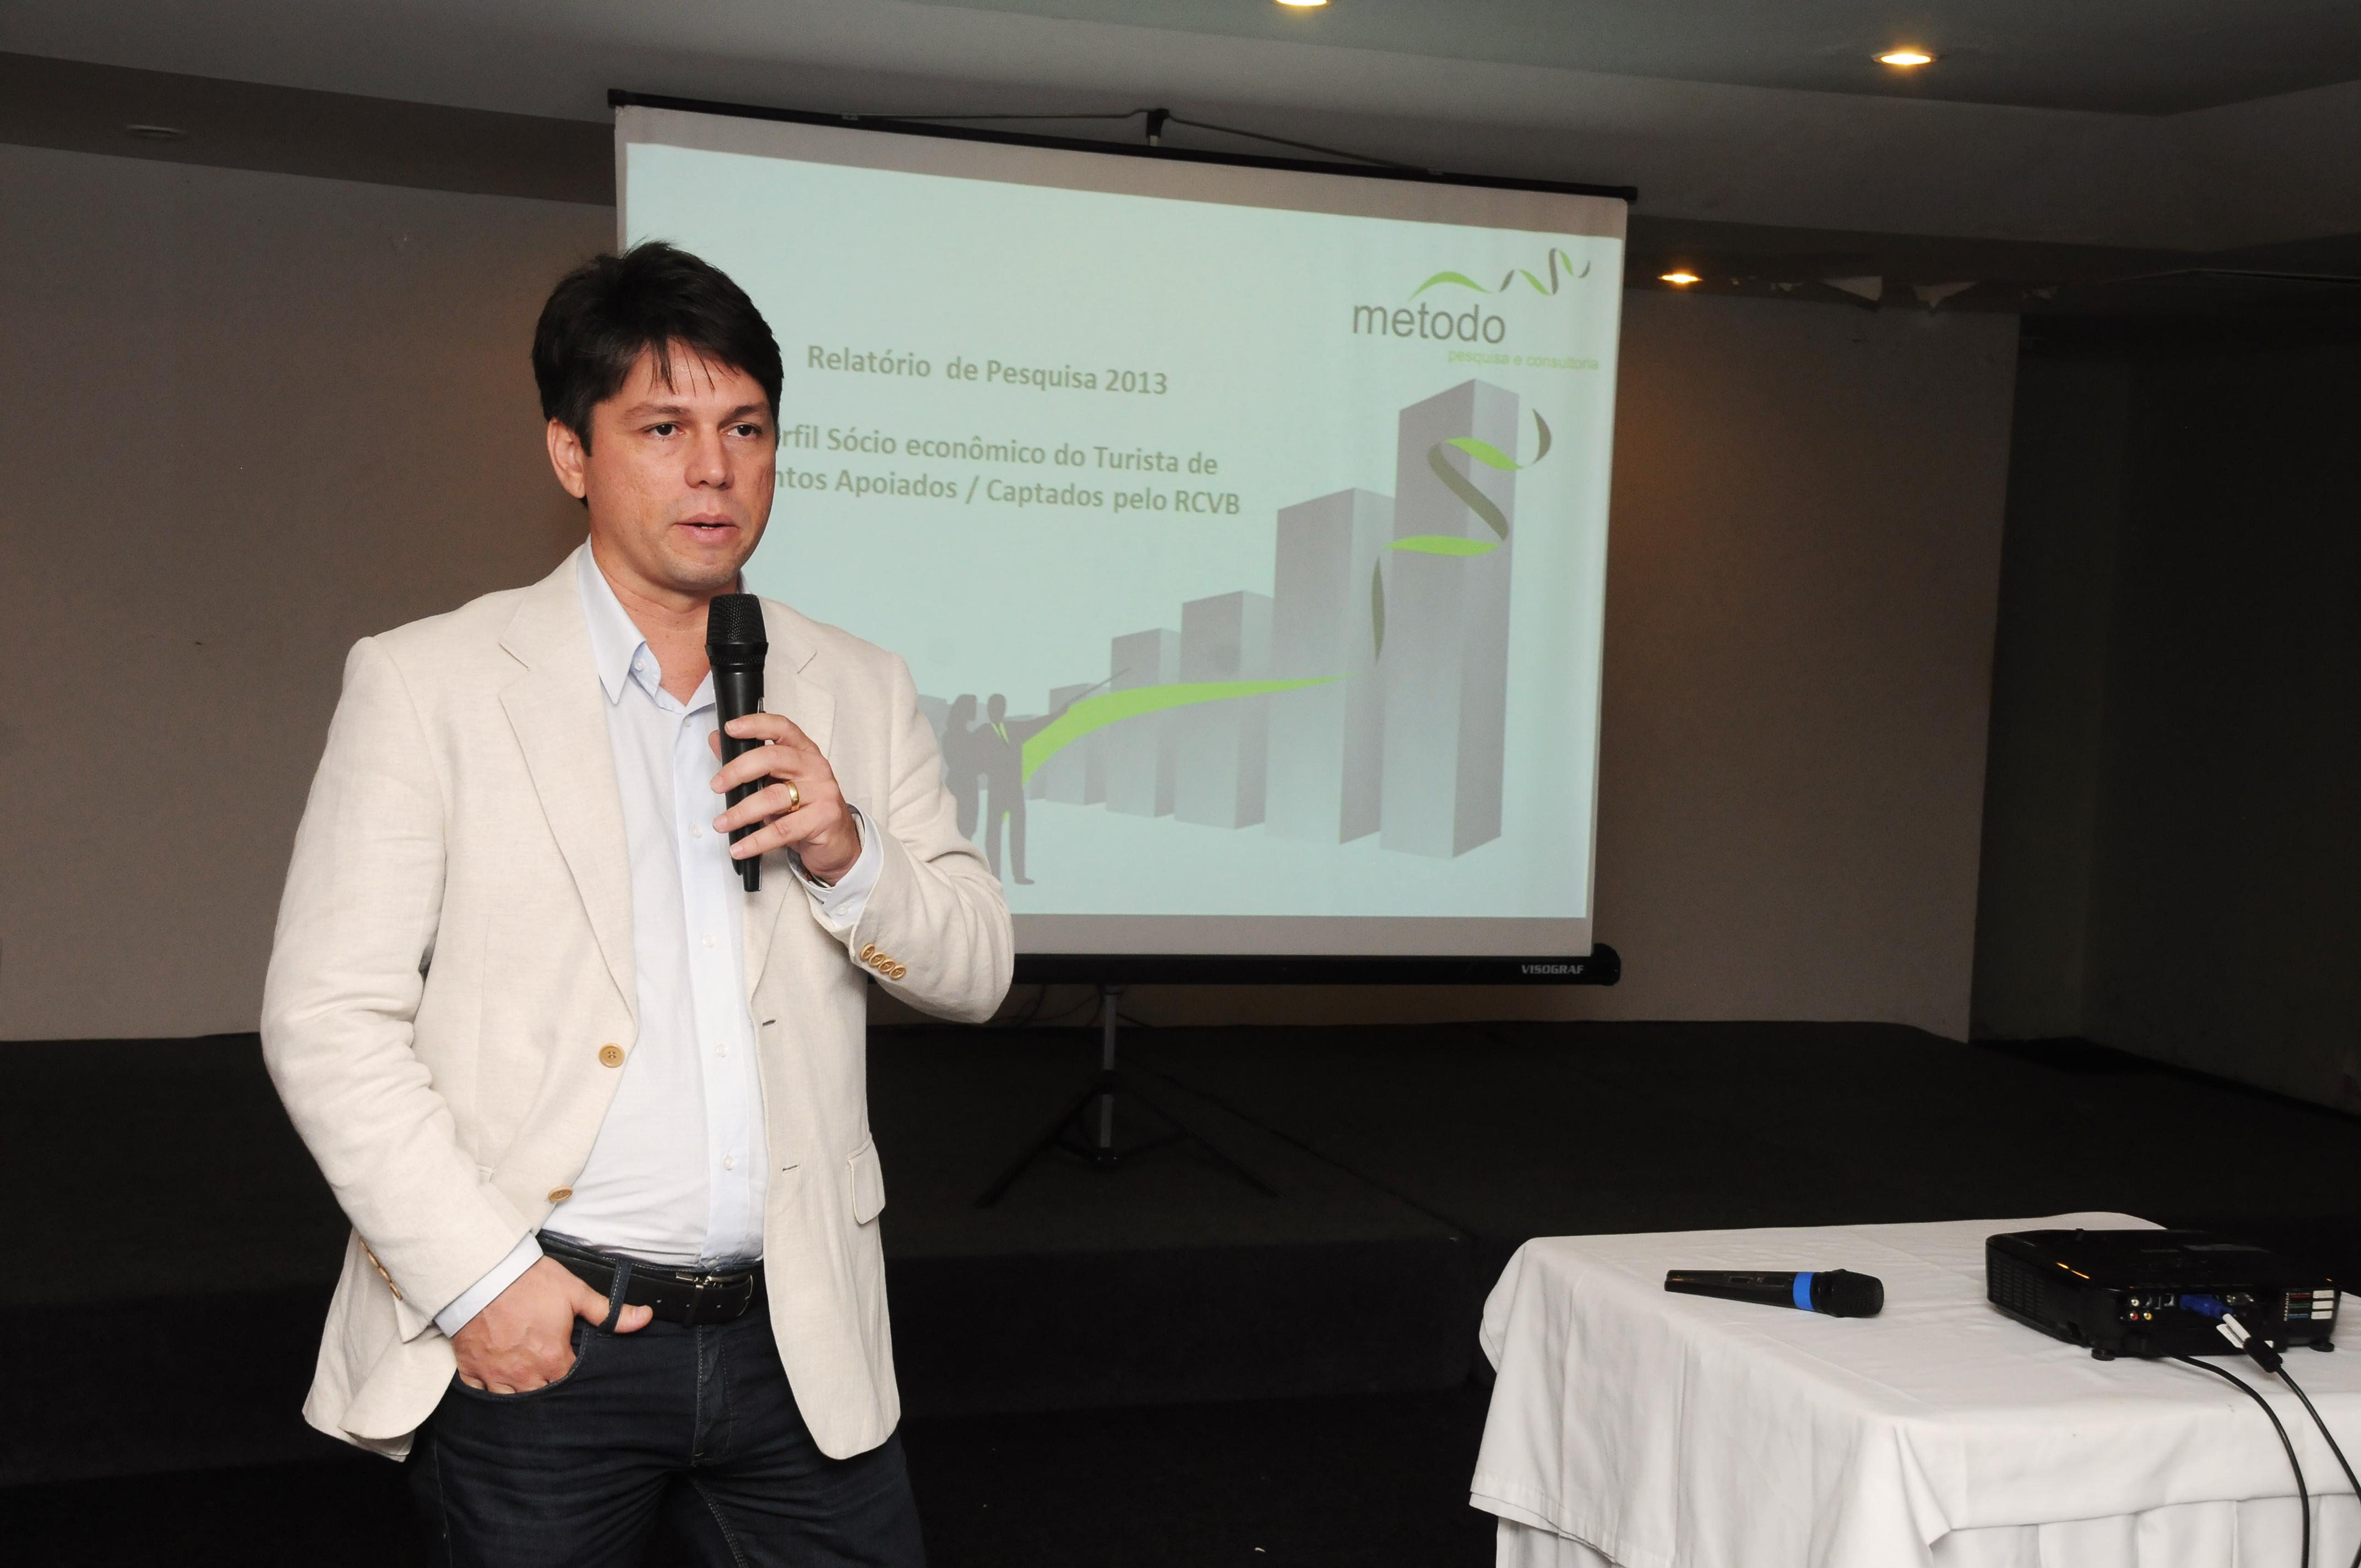 Recife convention visitors bureau divulga pesquisa sobre perfil